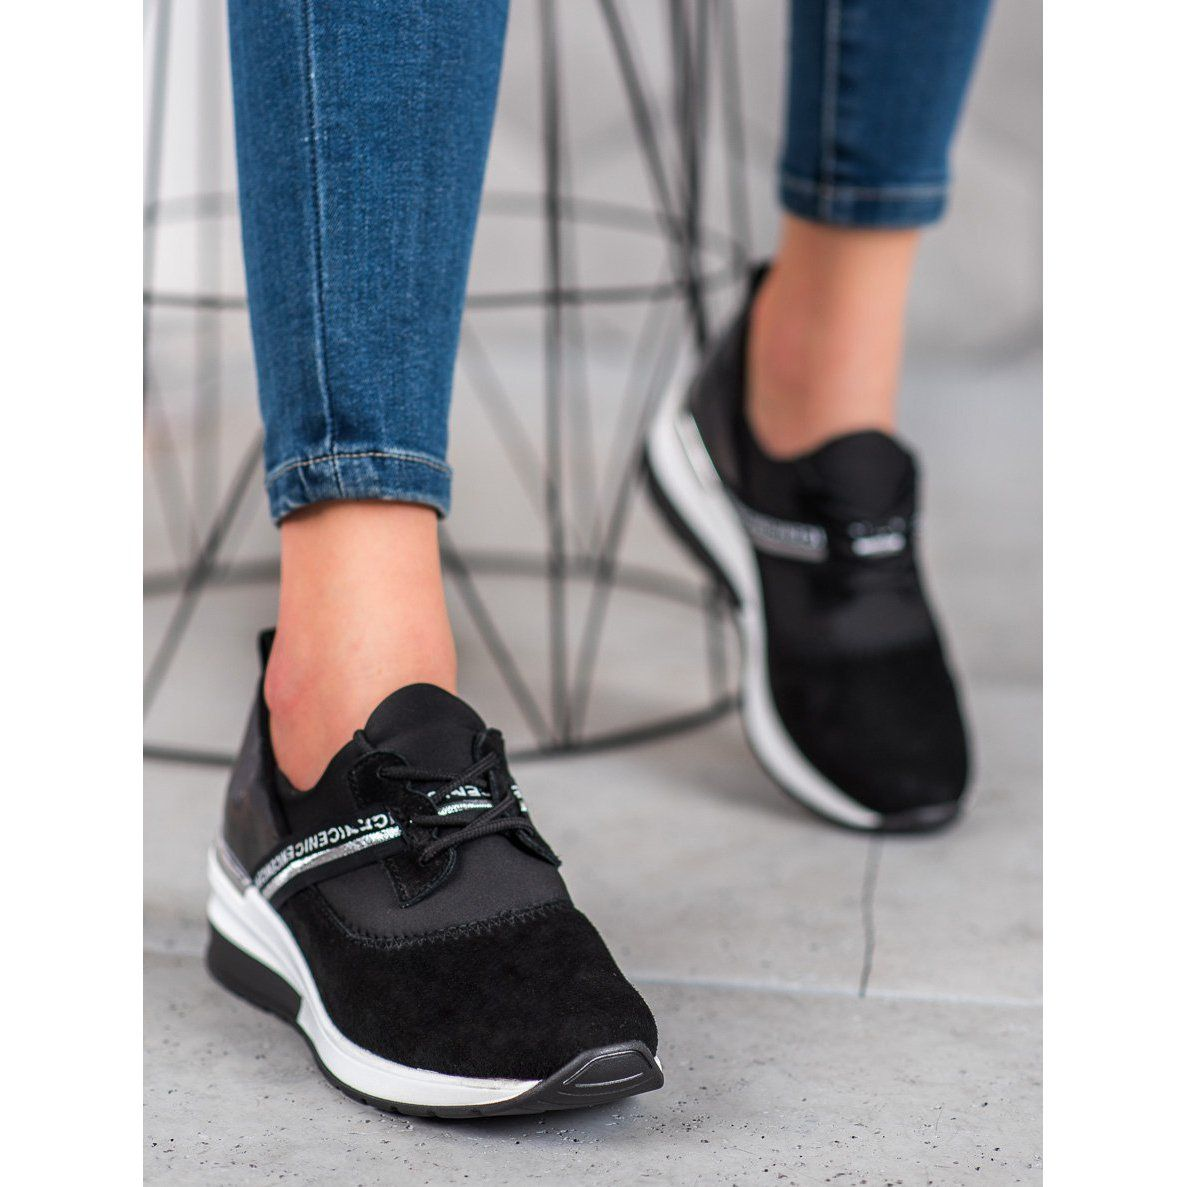 Filippo Skorzane Sneakersy Nice Czarne Leather Sneakers Types Of Heels Leather Heels